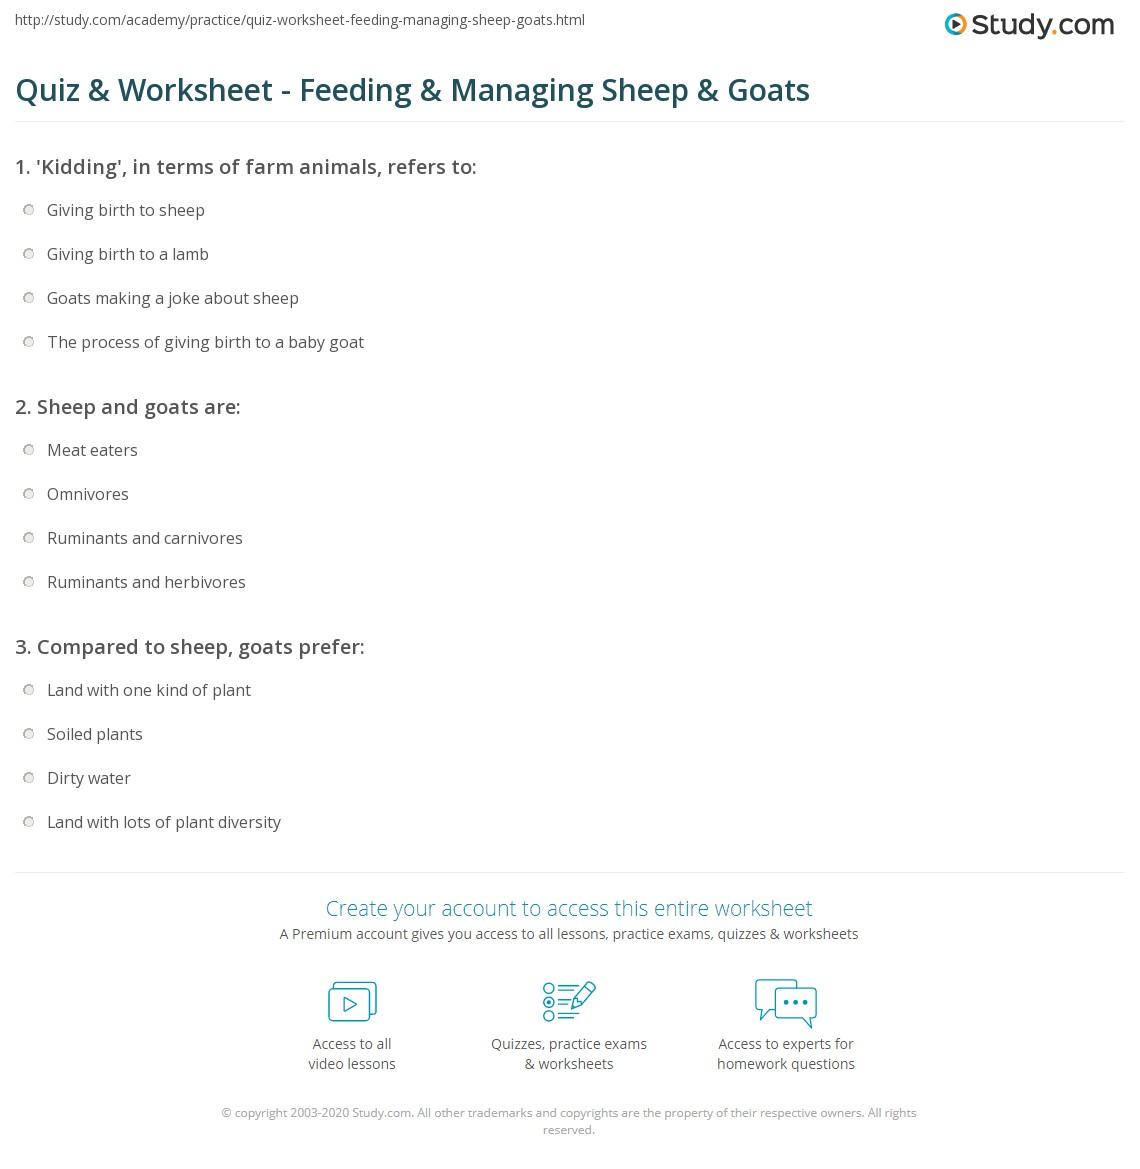 quiz worksheet feeding managing sheep goats studycom